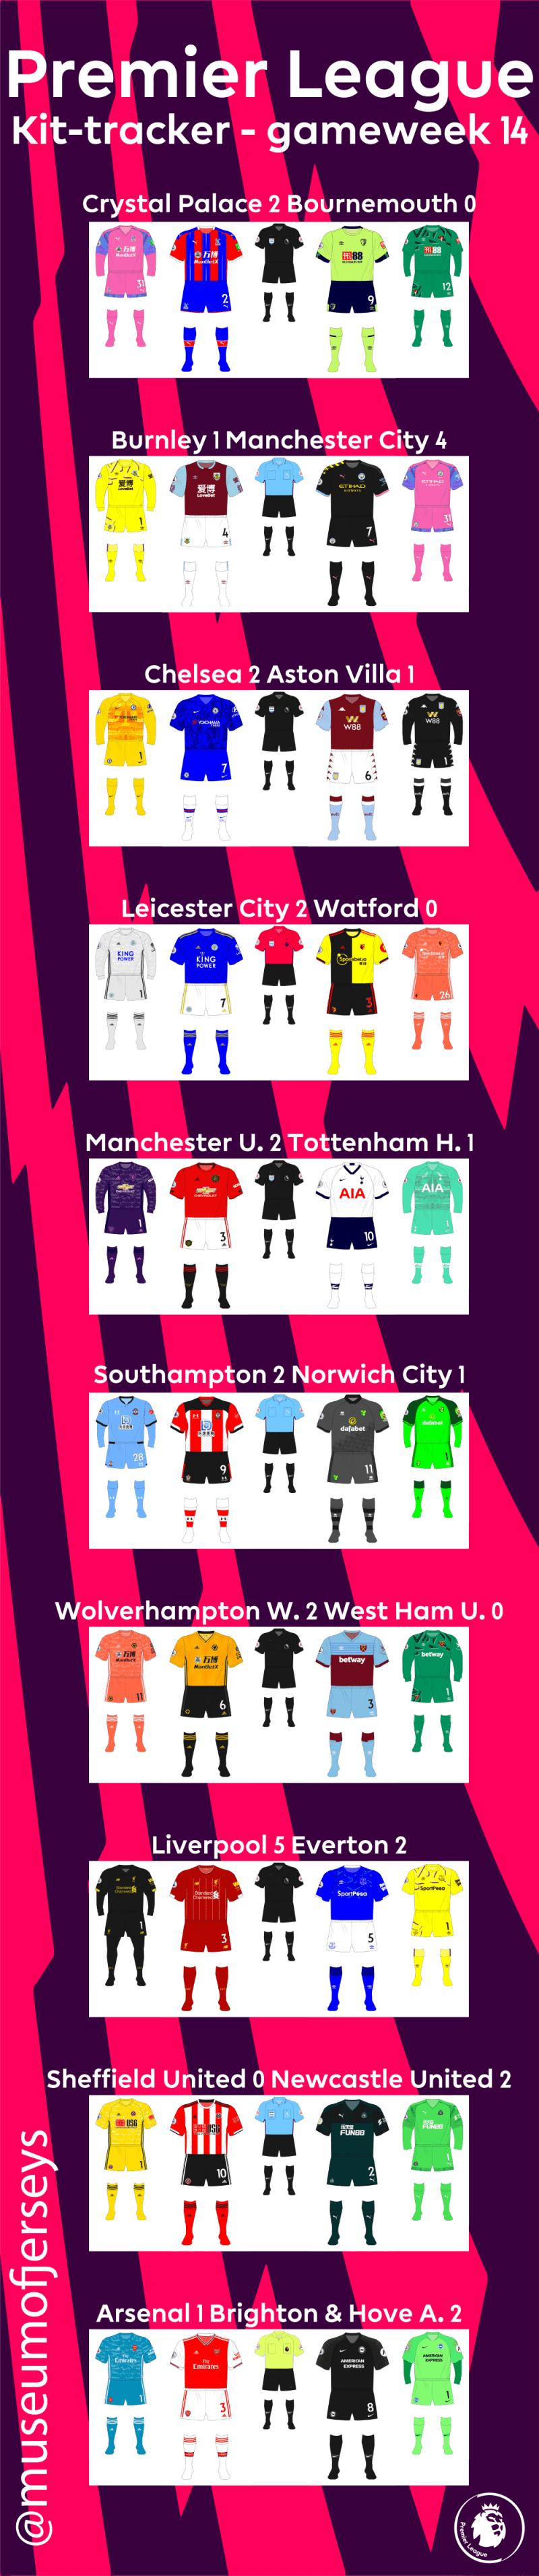 2019-2020-Premier-League-Kit-Tracker-Gameweek-15-long-01